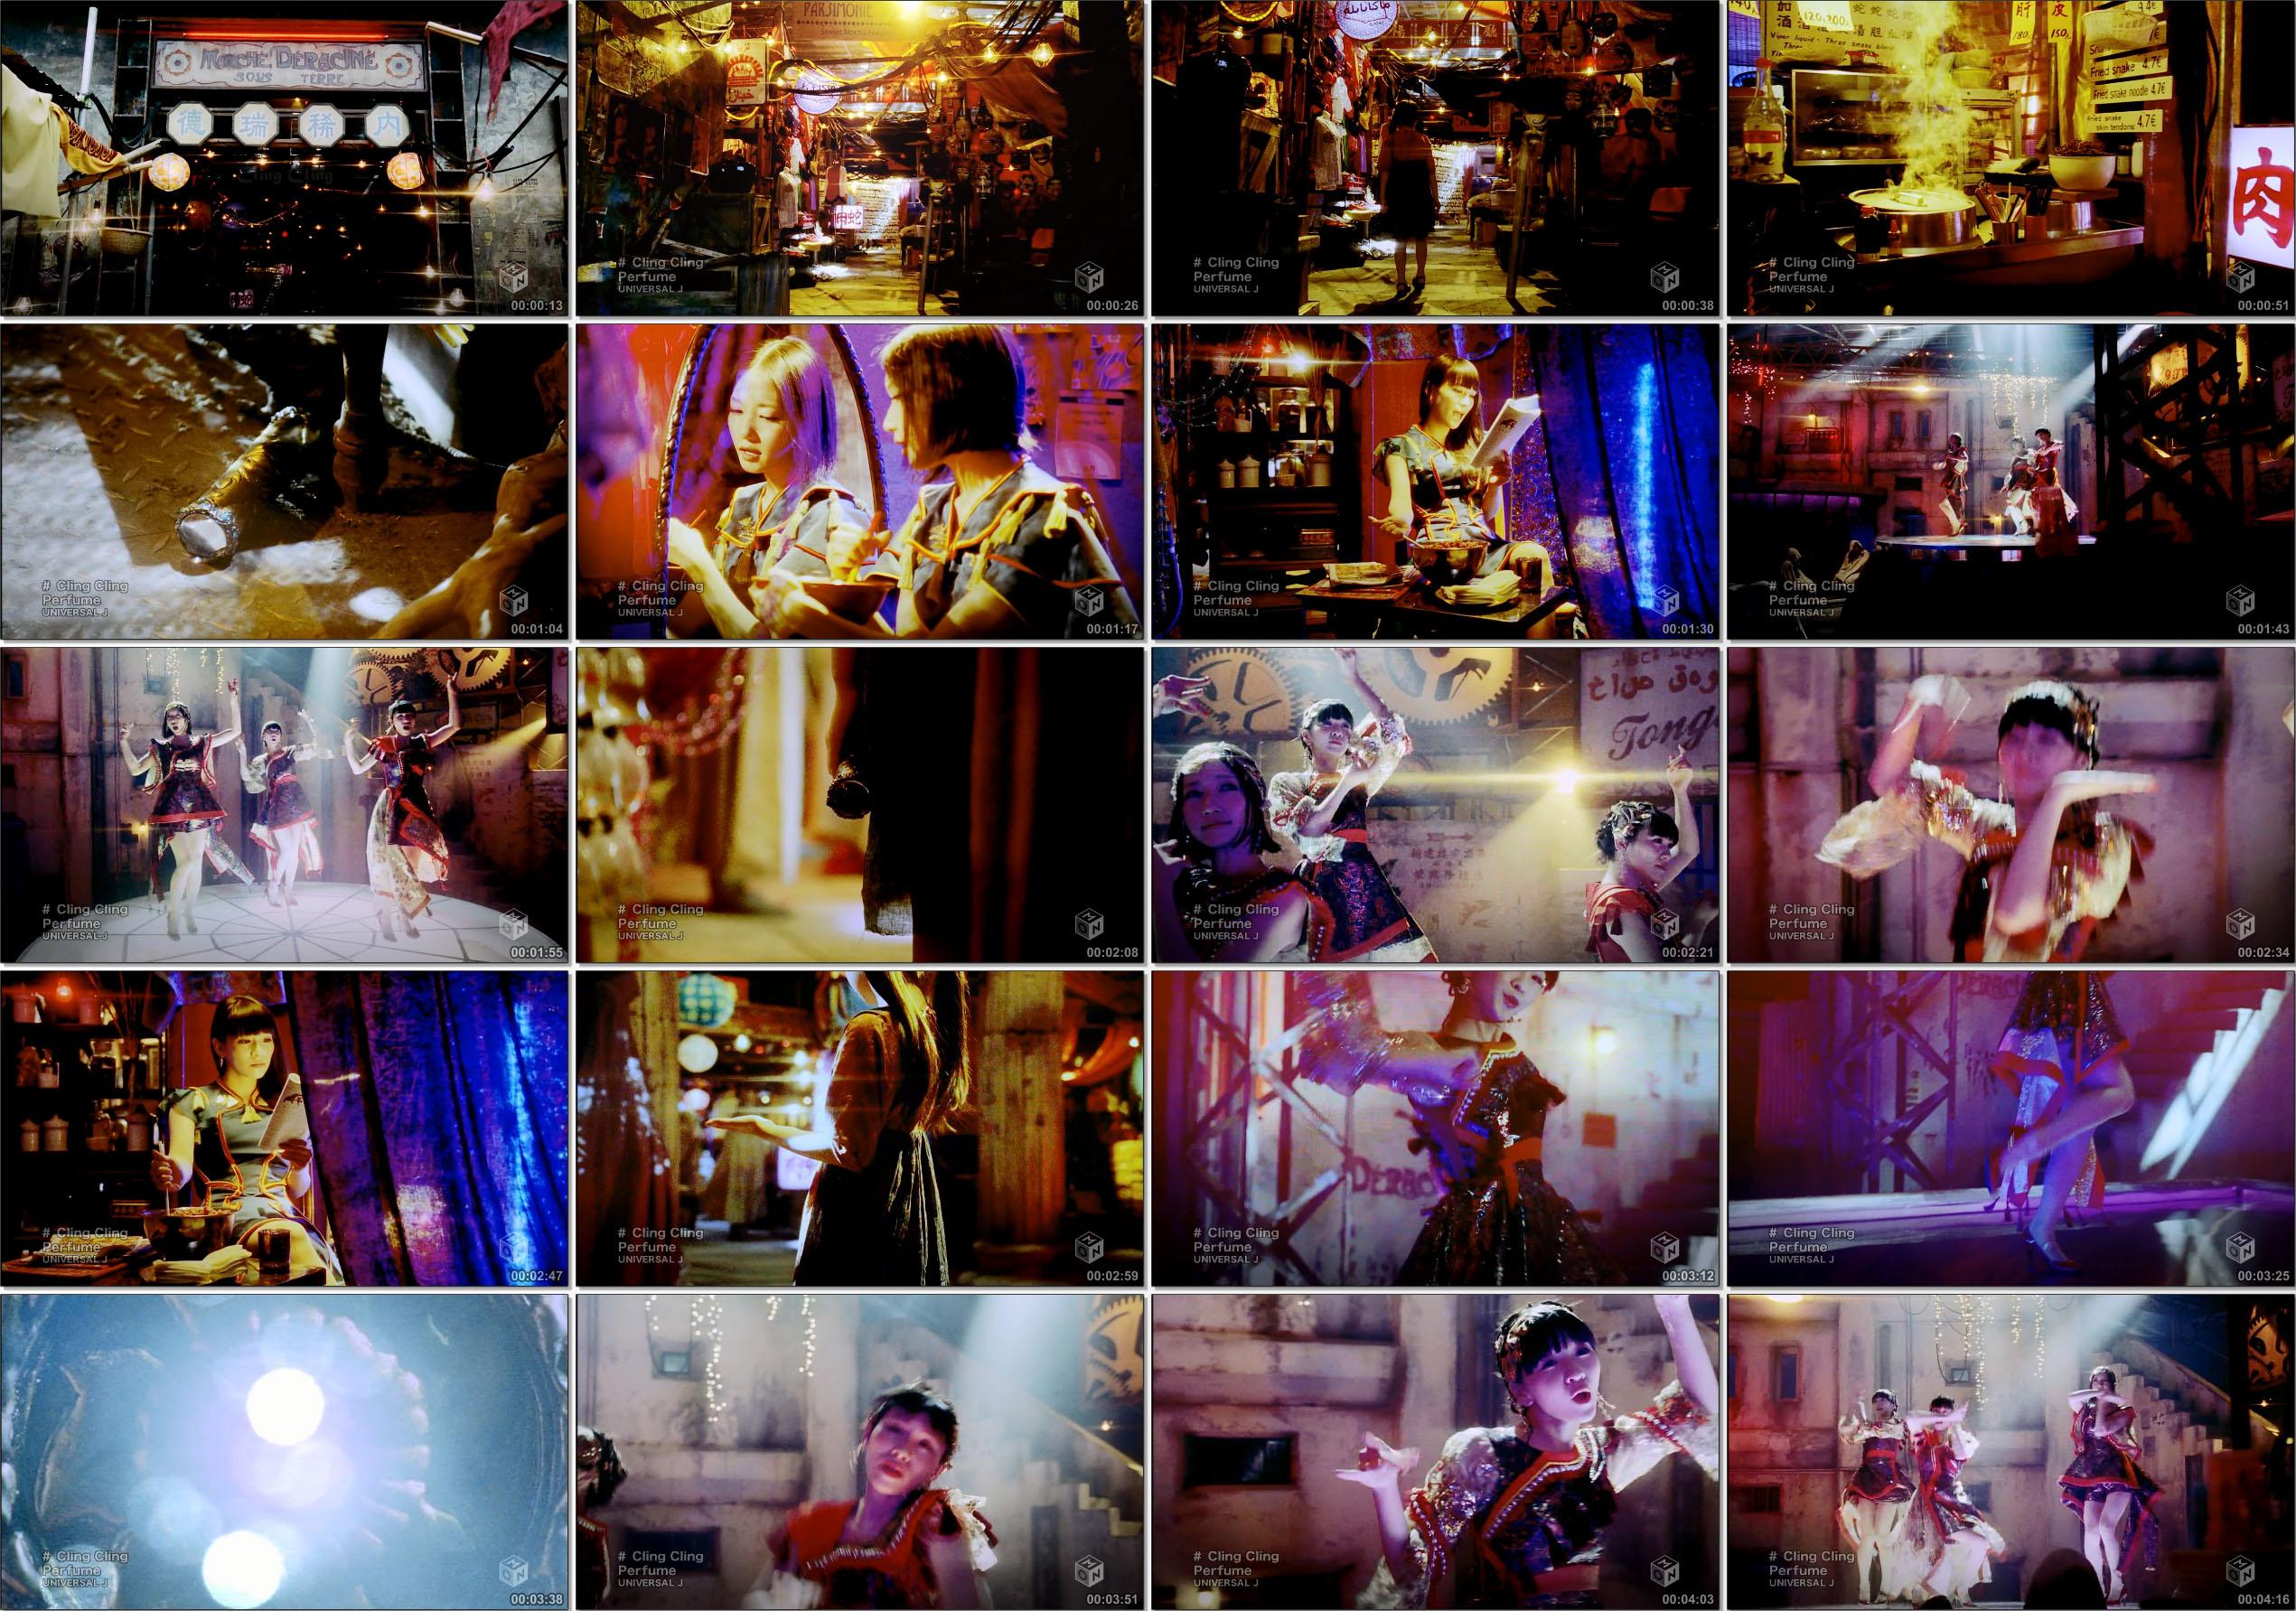 Perfume - Cling Cling [2014.07.16]